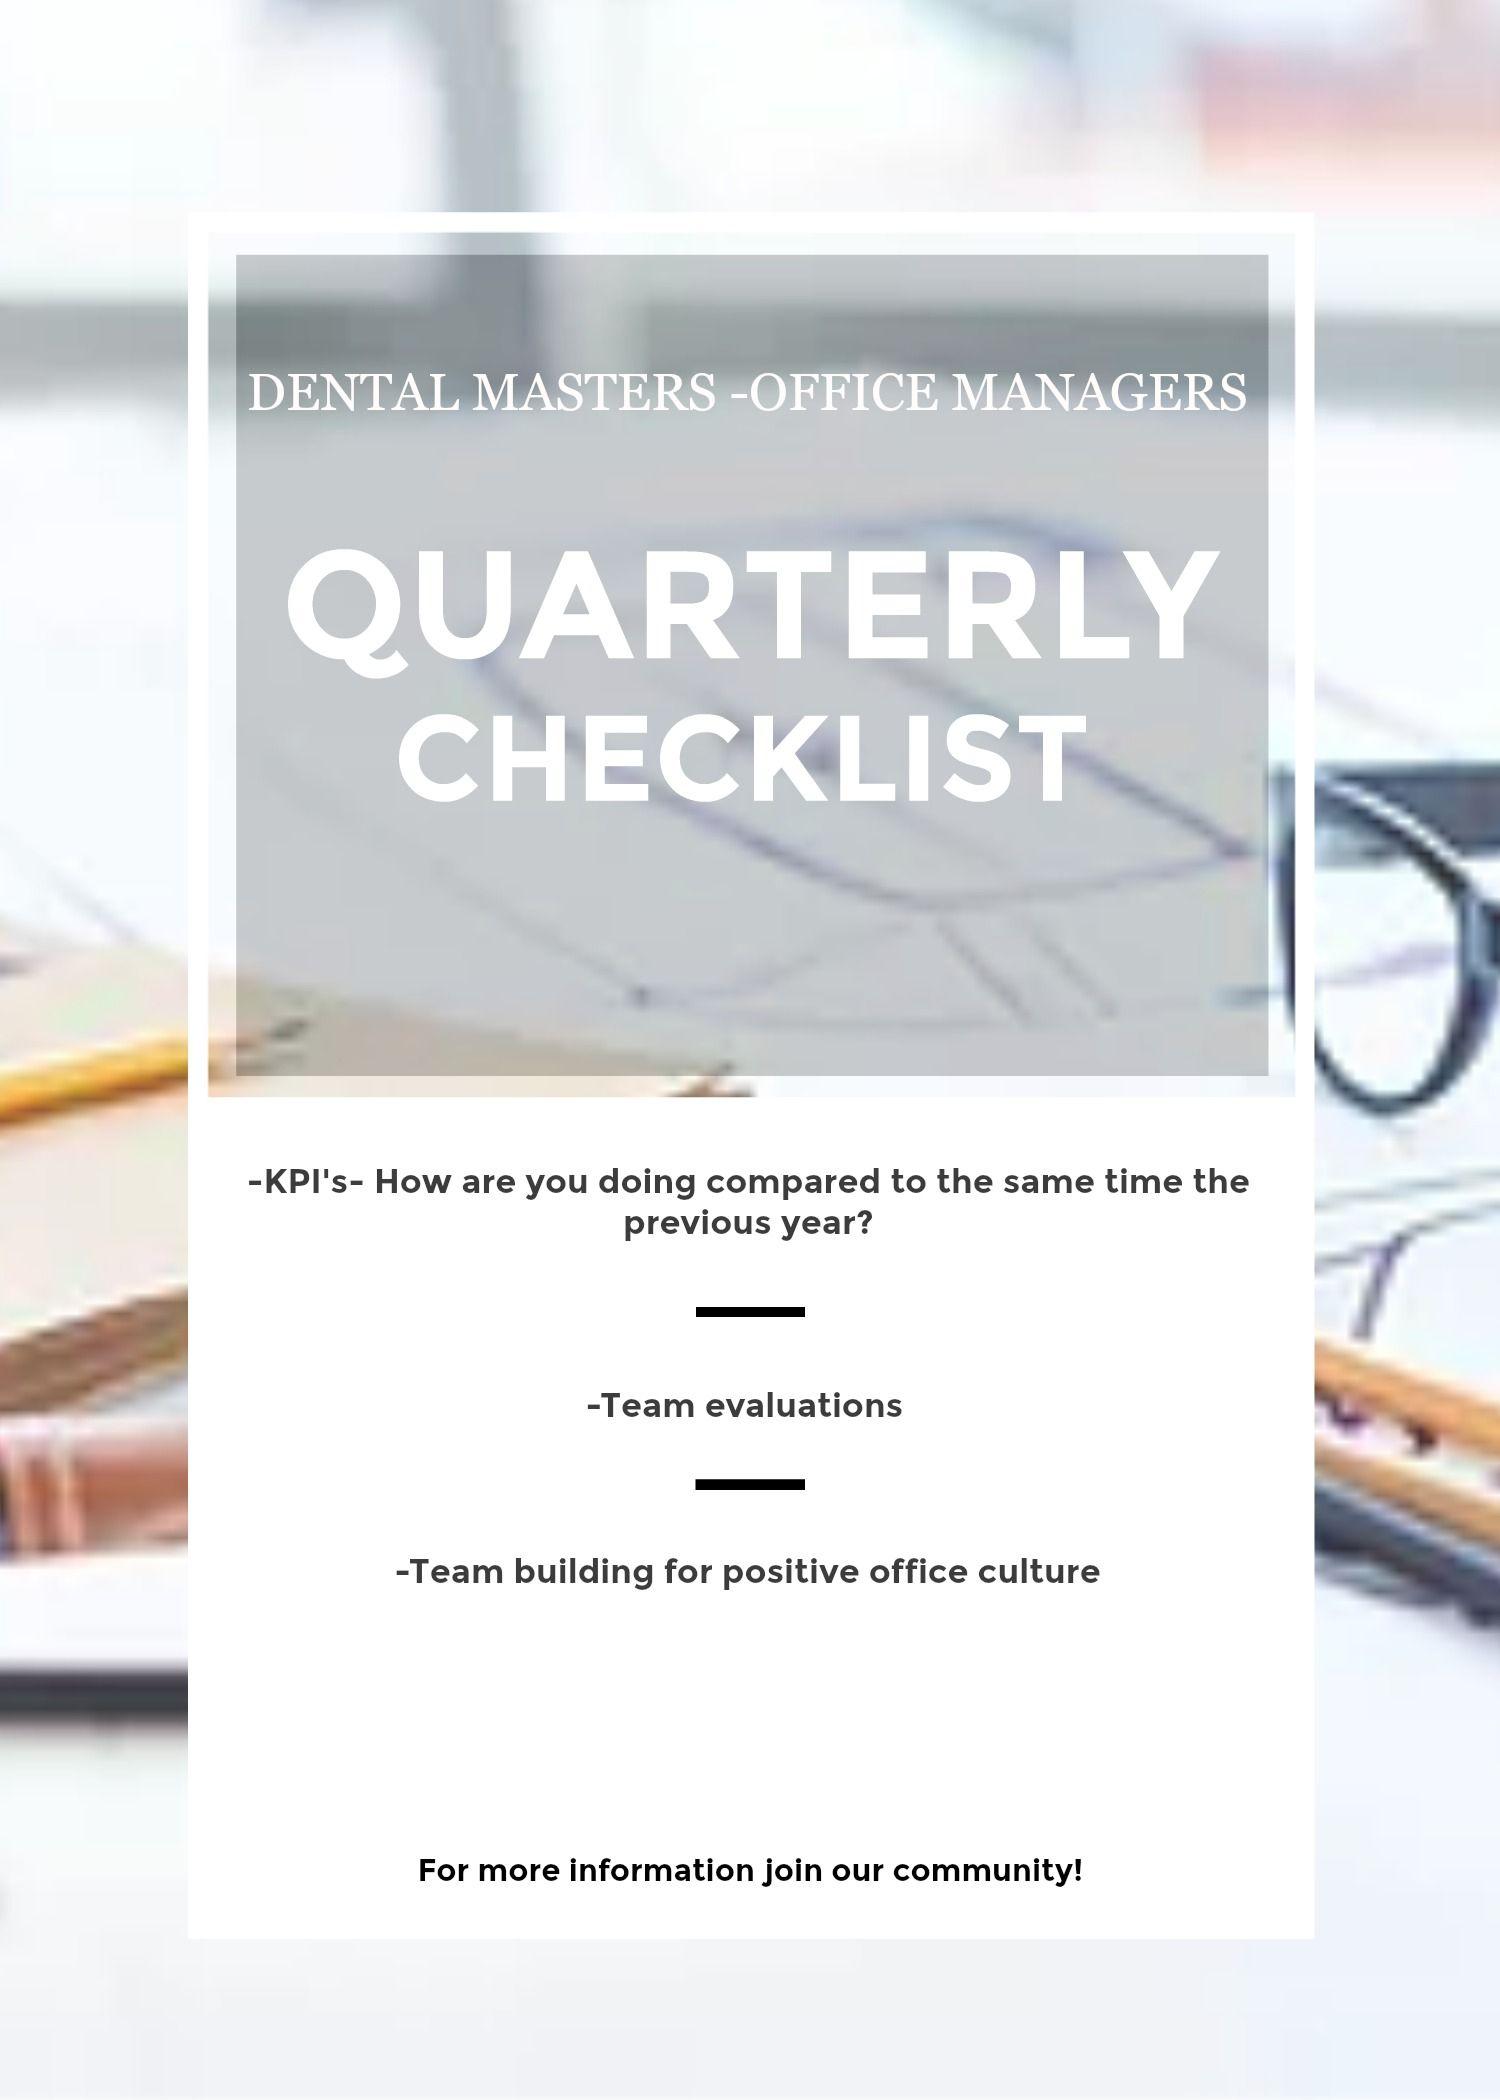 Office manager quarterly checklist dentistry dentalofficemanager office manager quarterly checklist dentistry dentalofficemanager dentist office dpp altavistaventures Choice Image